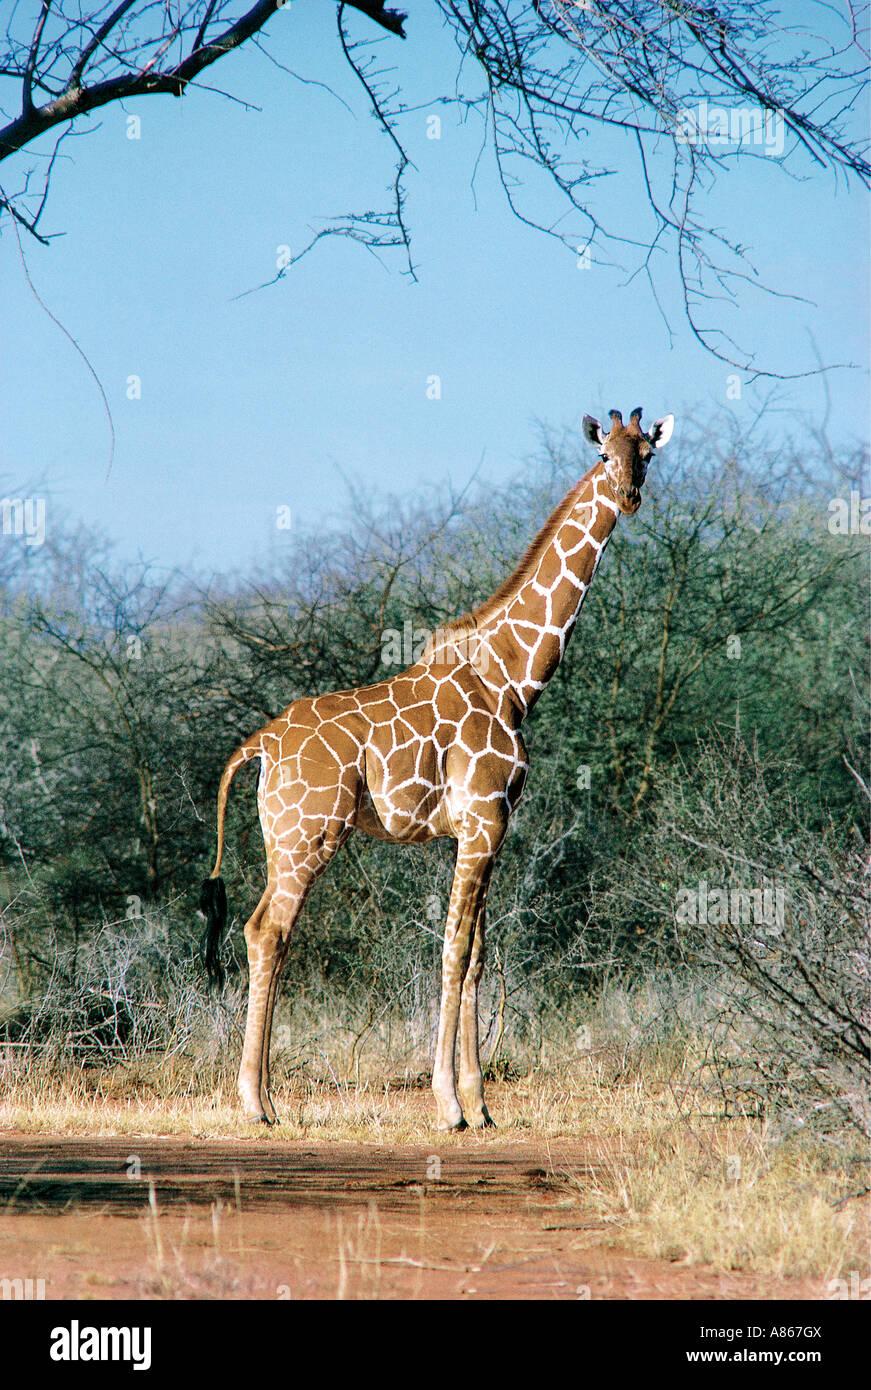 Reticulated Giraffe Samburu National Reserve Kenya - Stock Image